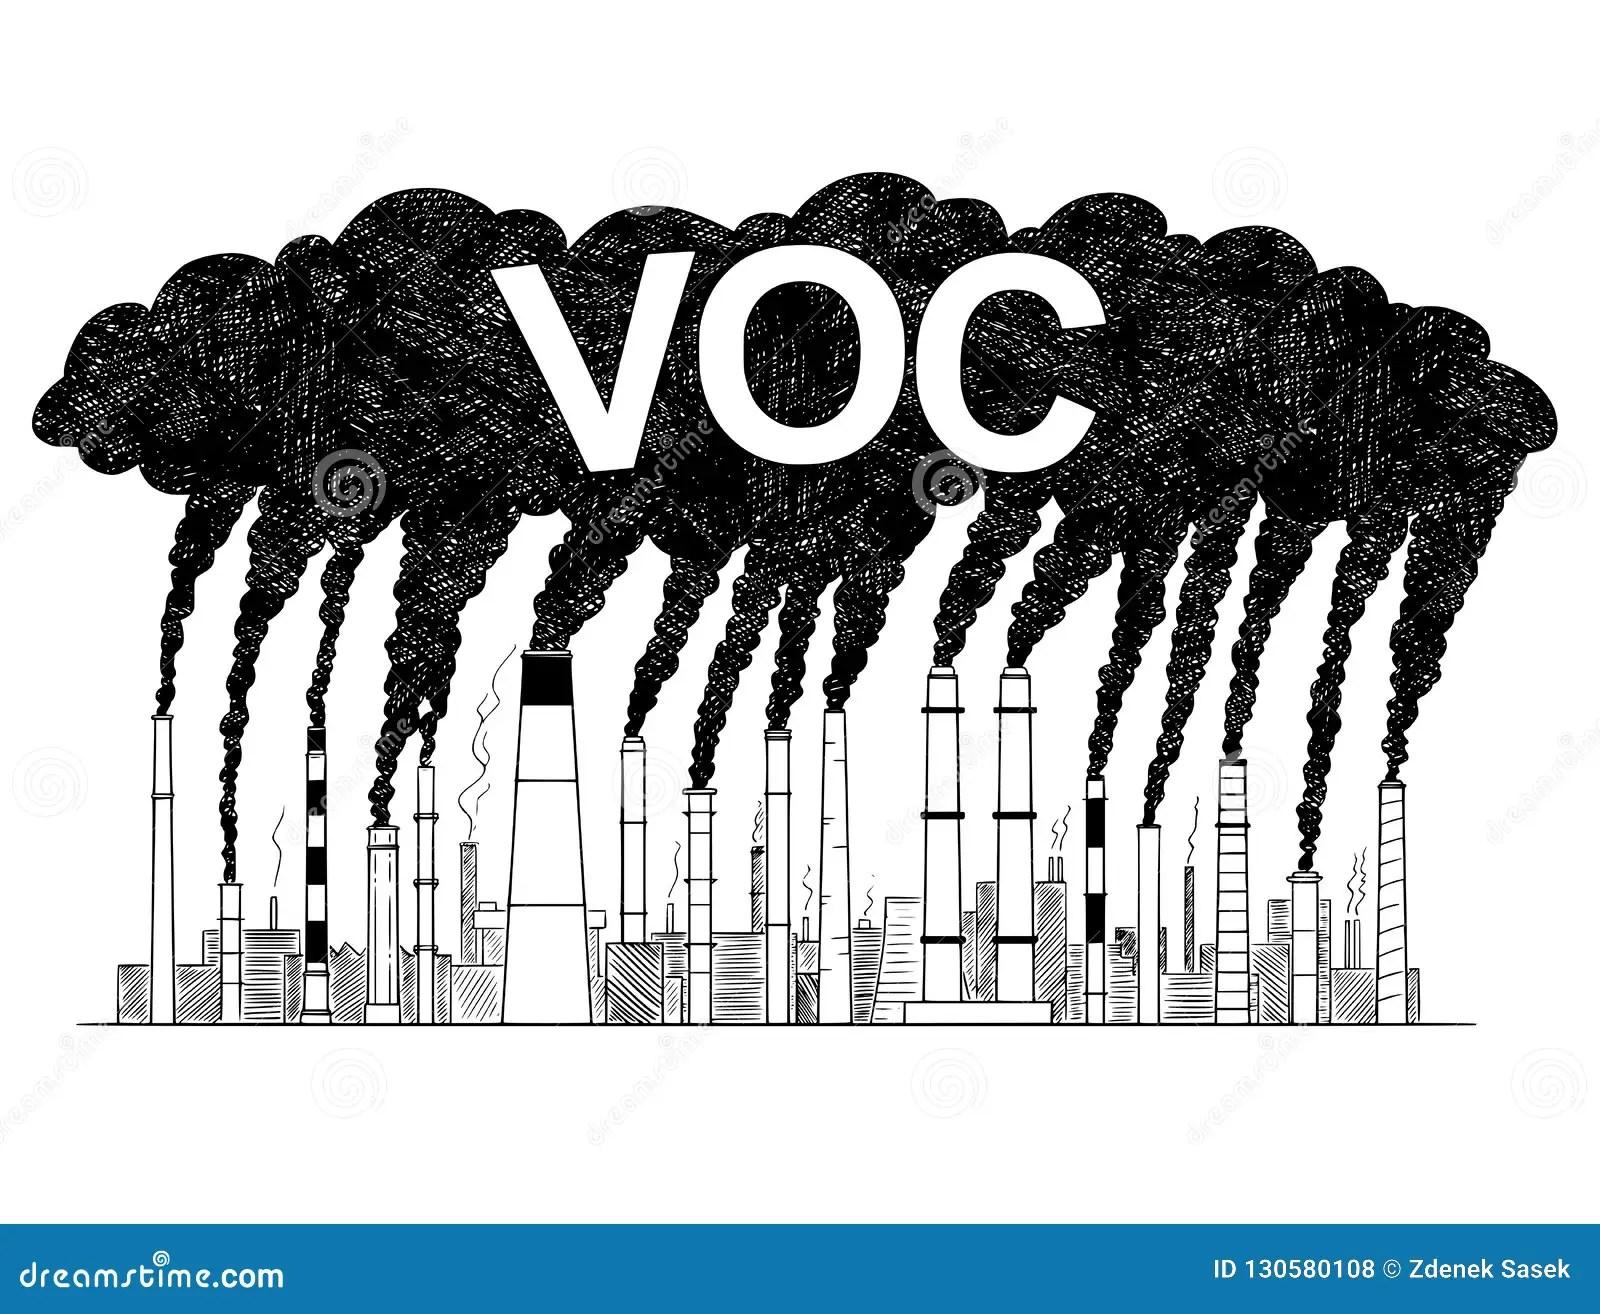 Vector Artistic Drawing Illustration Of Smoking